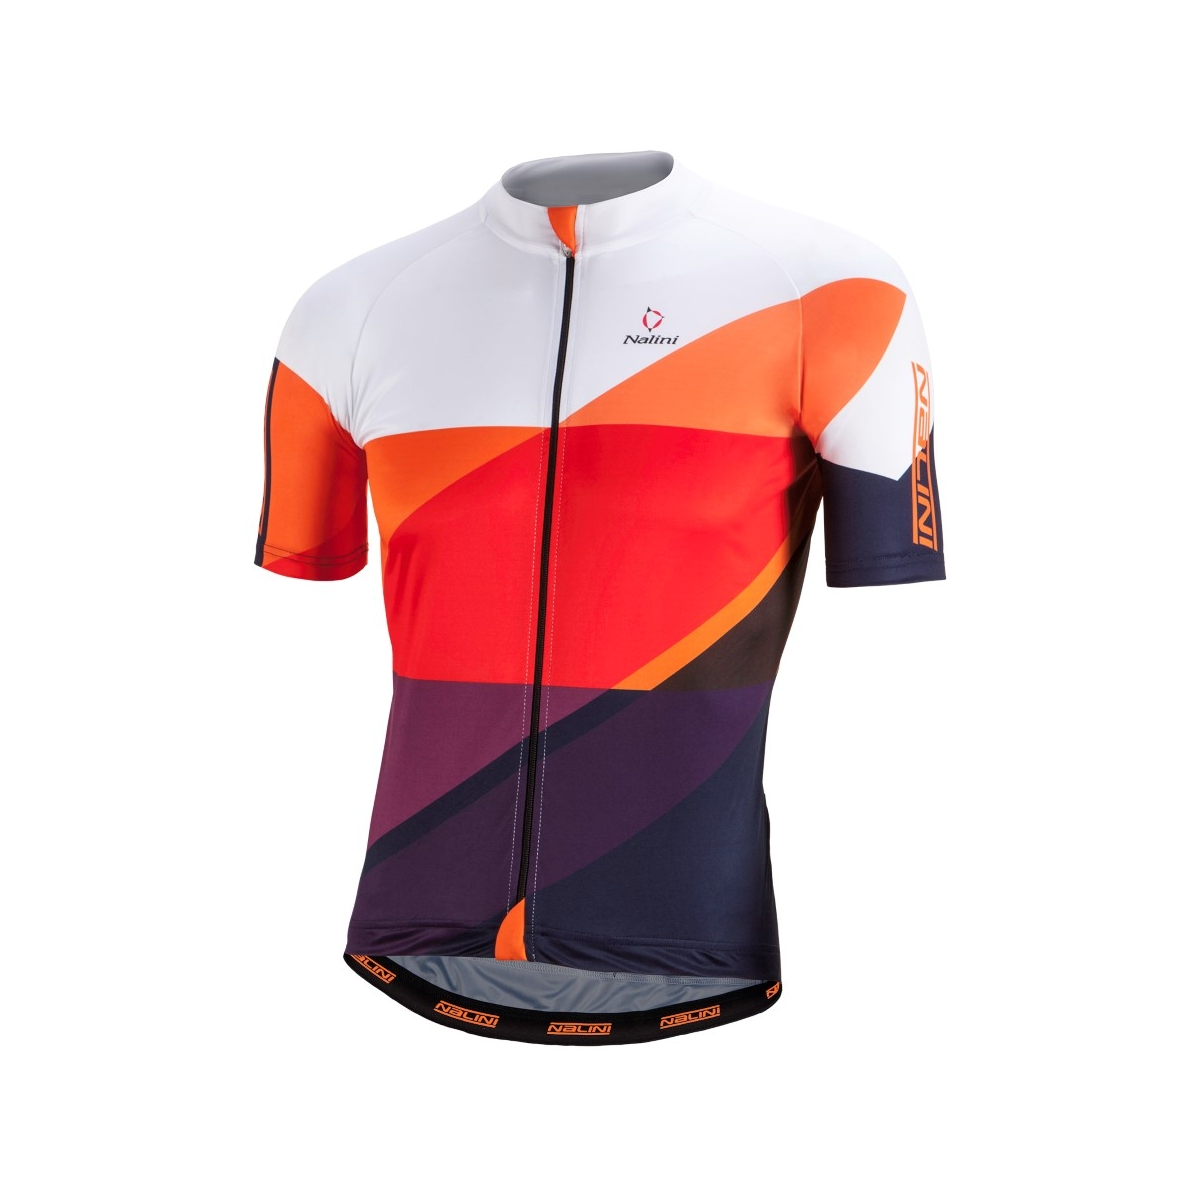 Koszulka kolarska Nalini Campione 4151